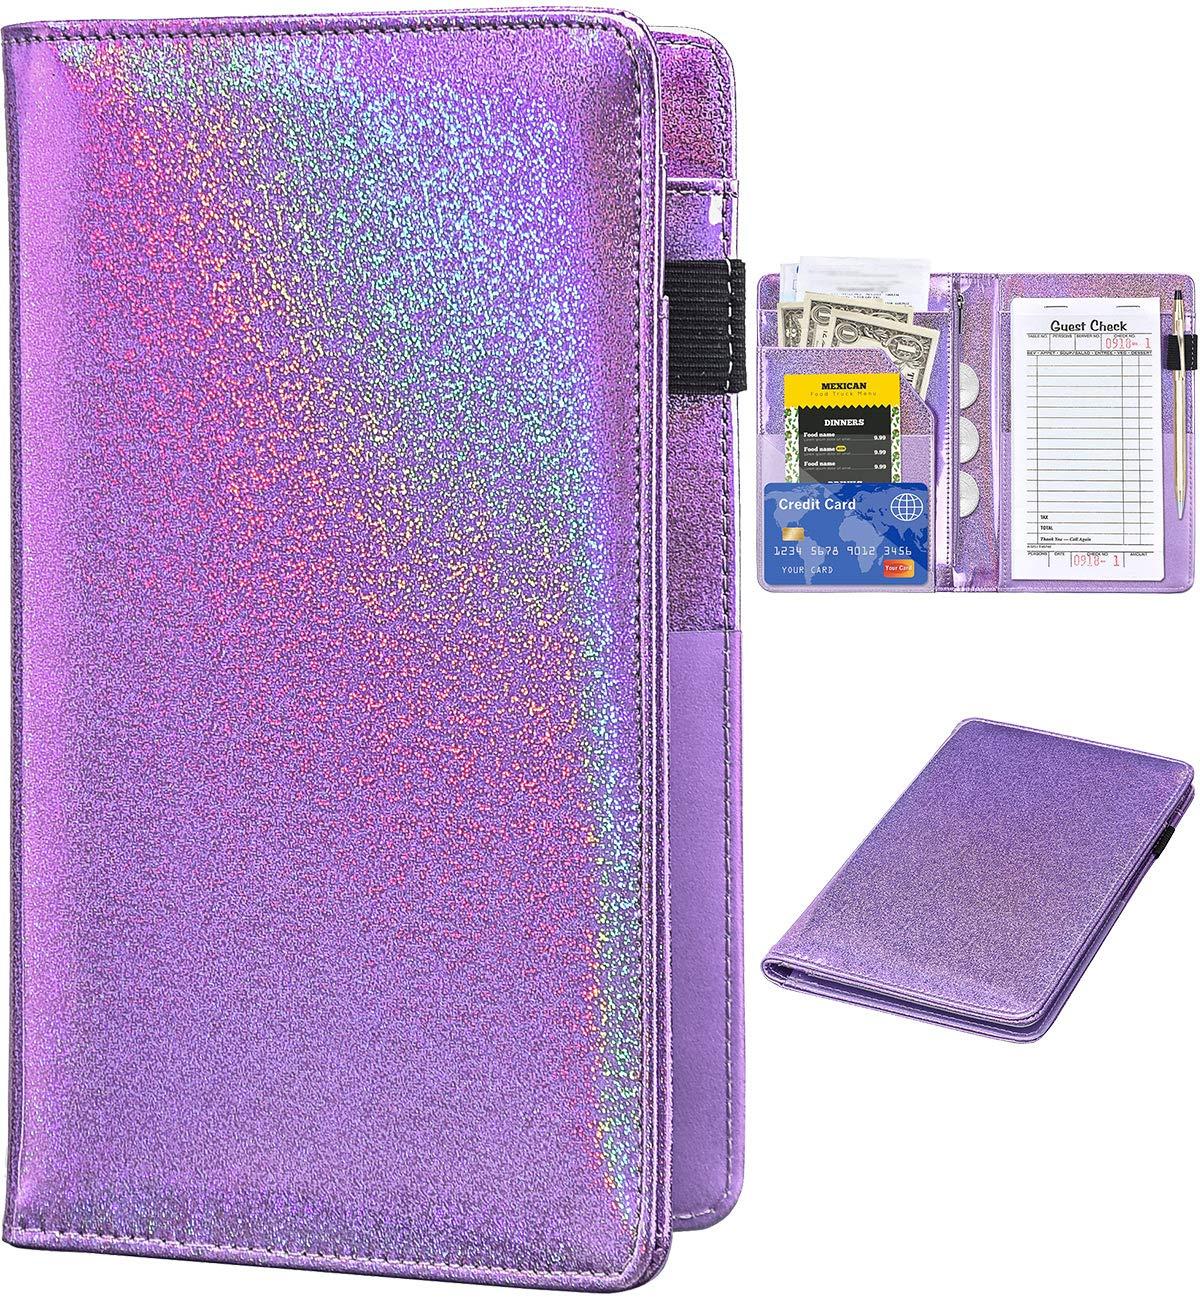 Server Books for Waitress - Glitter Leather Waiter Book Server Wallet with Zipper Pocket, Cute Waitress Book&Waitstaff Organizer with Money Pocket Fit Server Apron (Glitter Powdery Violet)